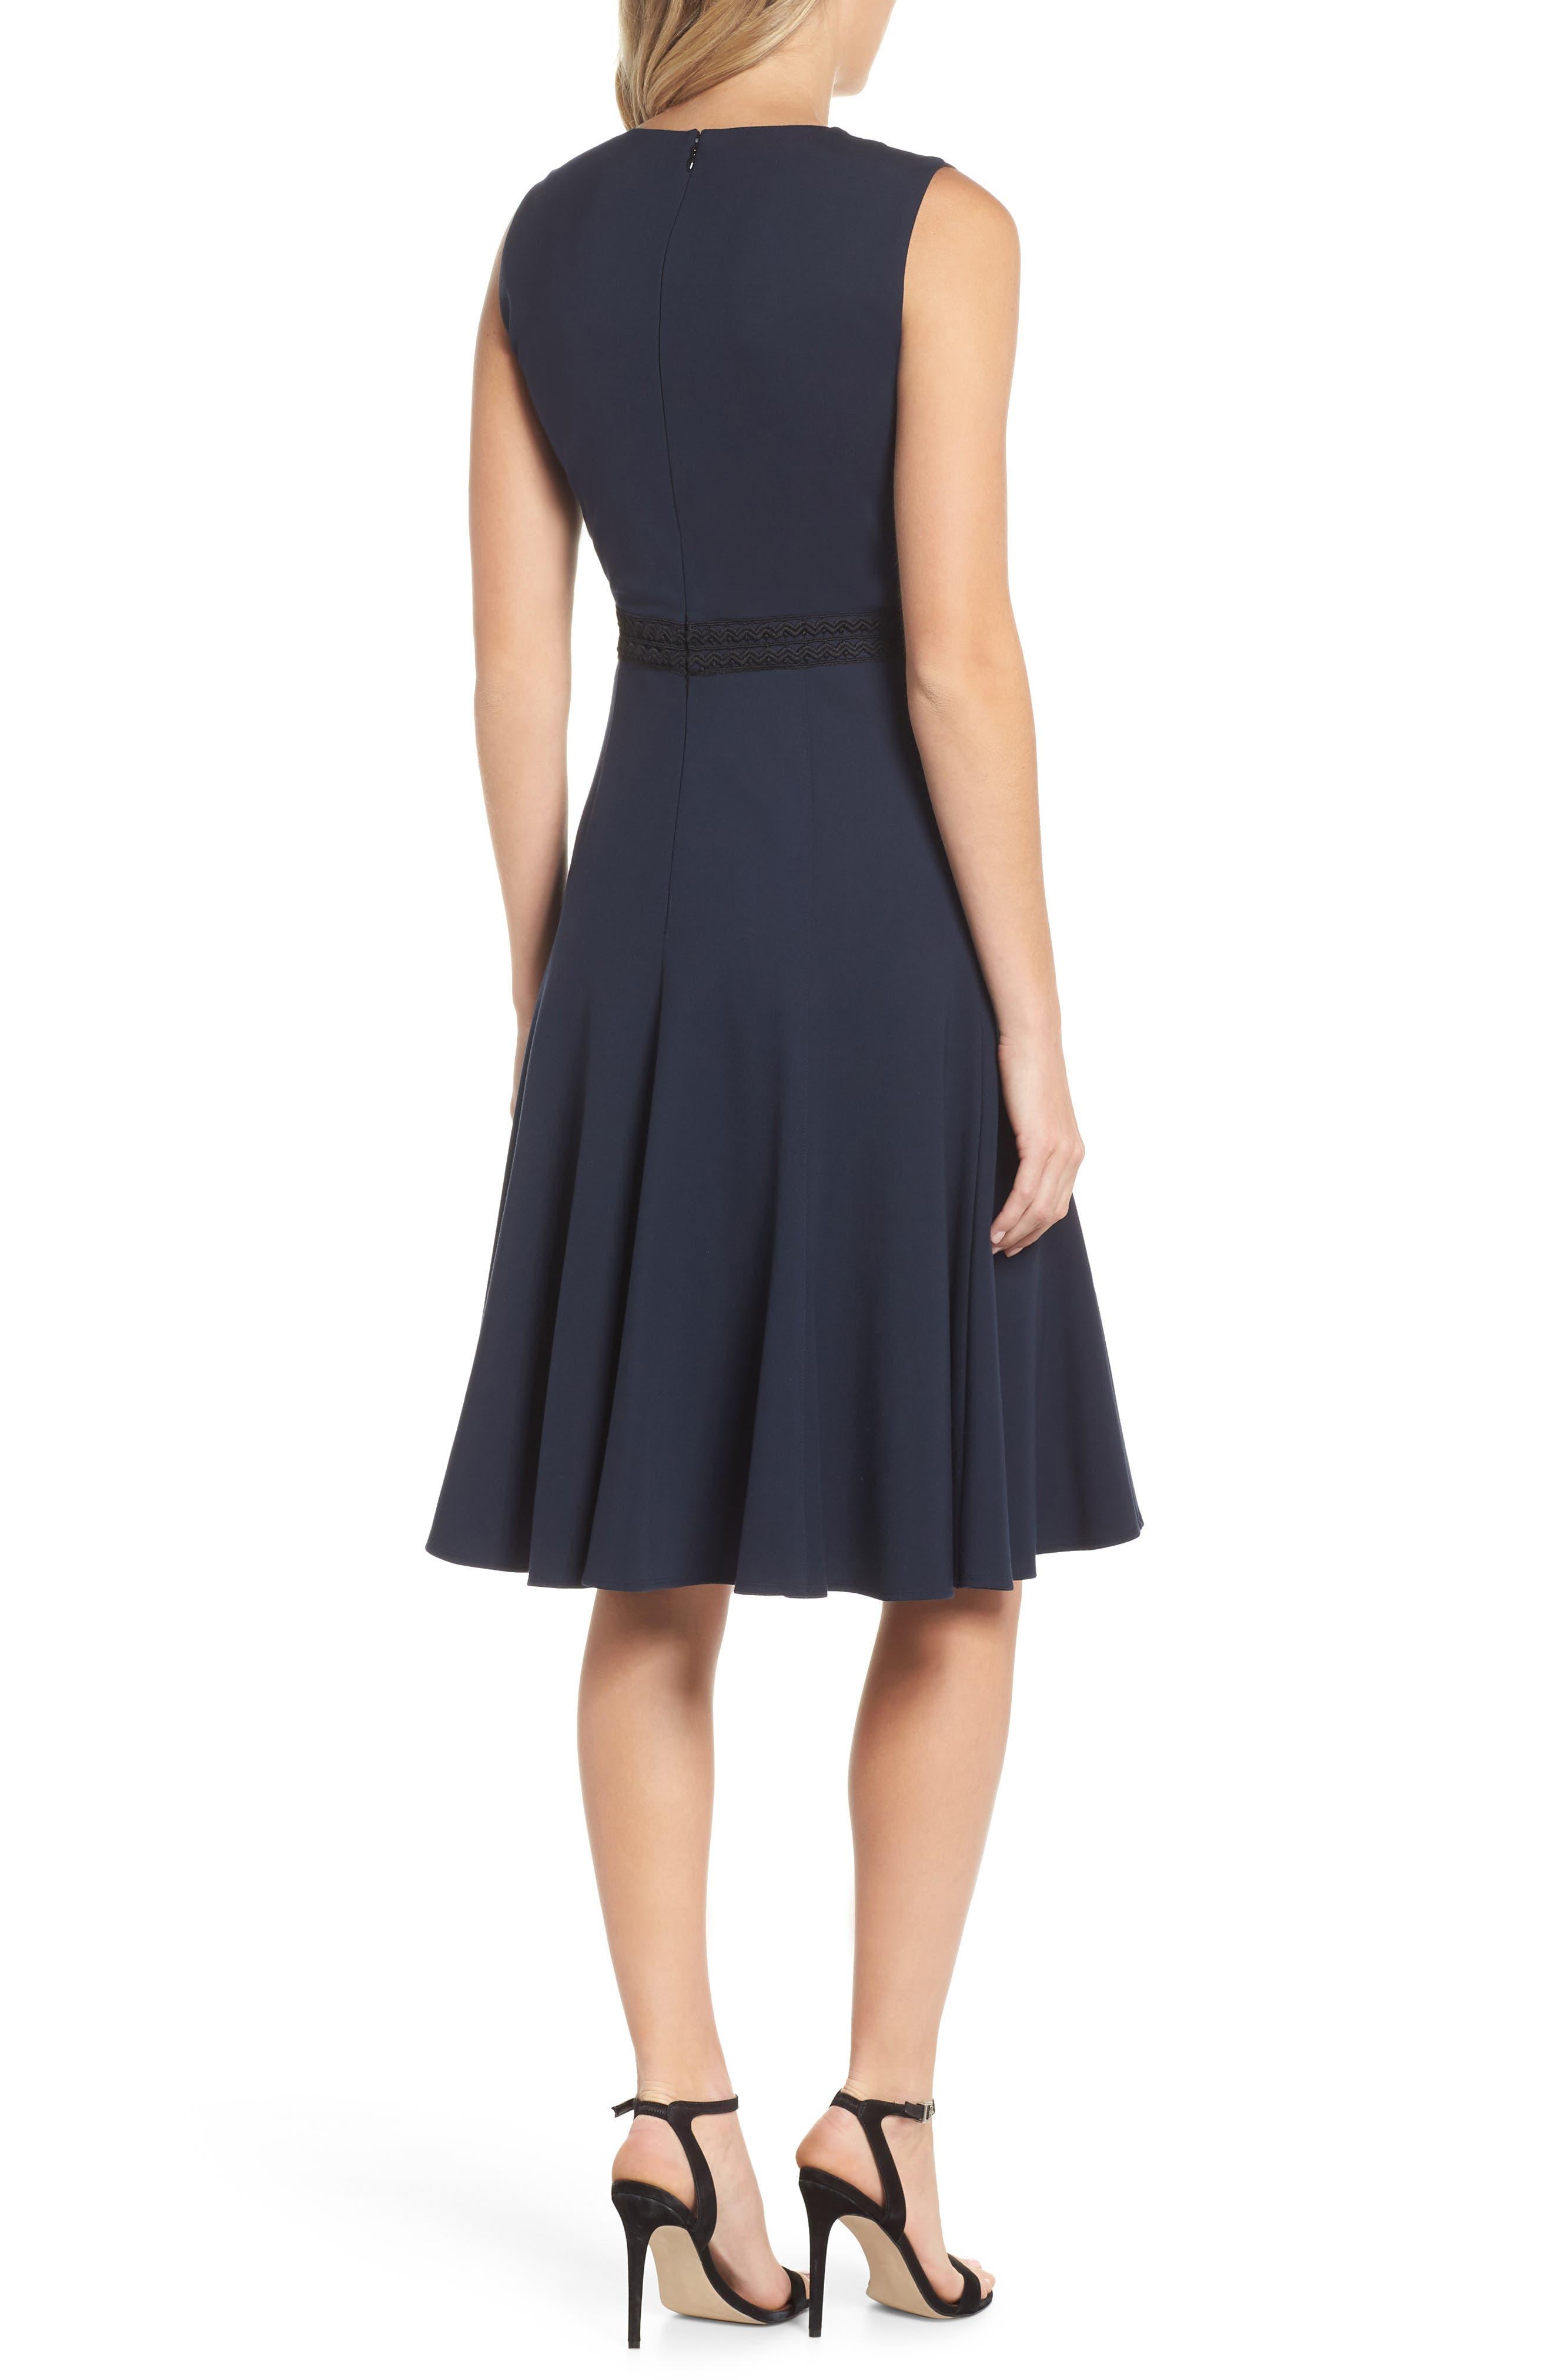 Hazel Lace Trim V-Neck Dress,                             Alternate thumbnail 2, color,                             Midnight Blue/ Black